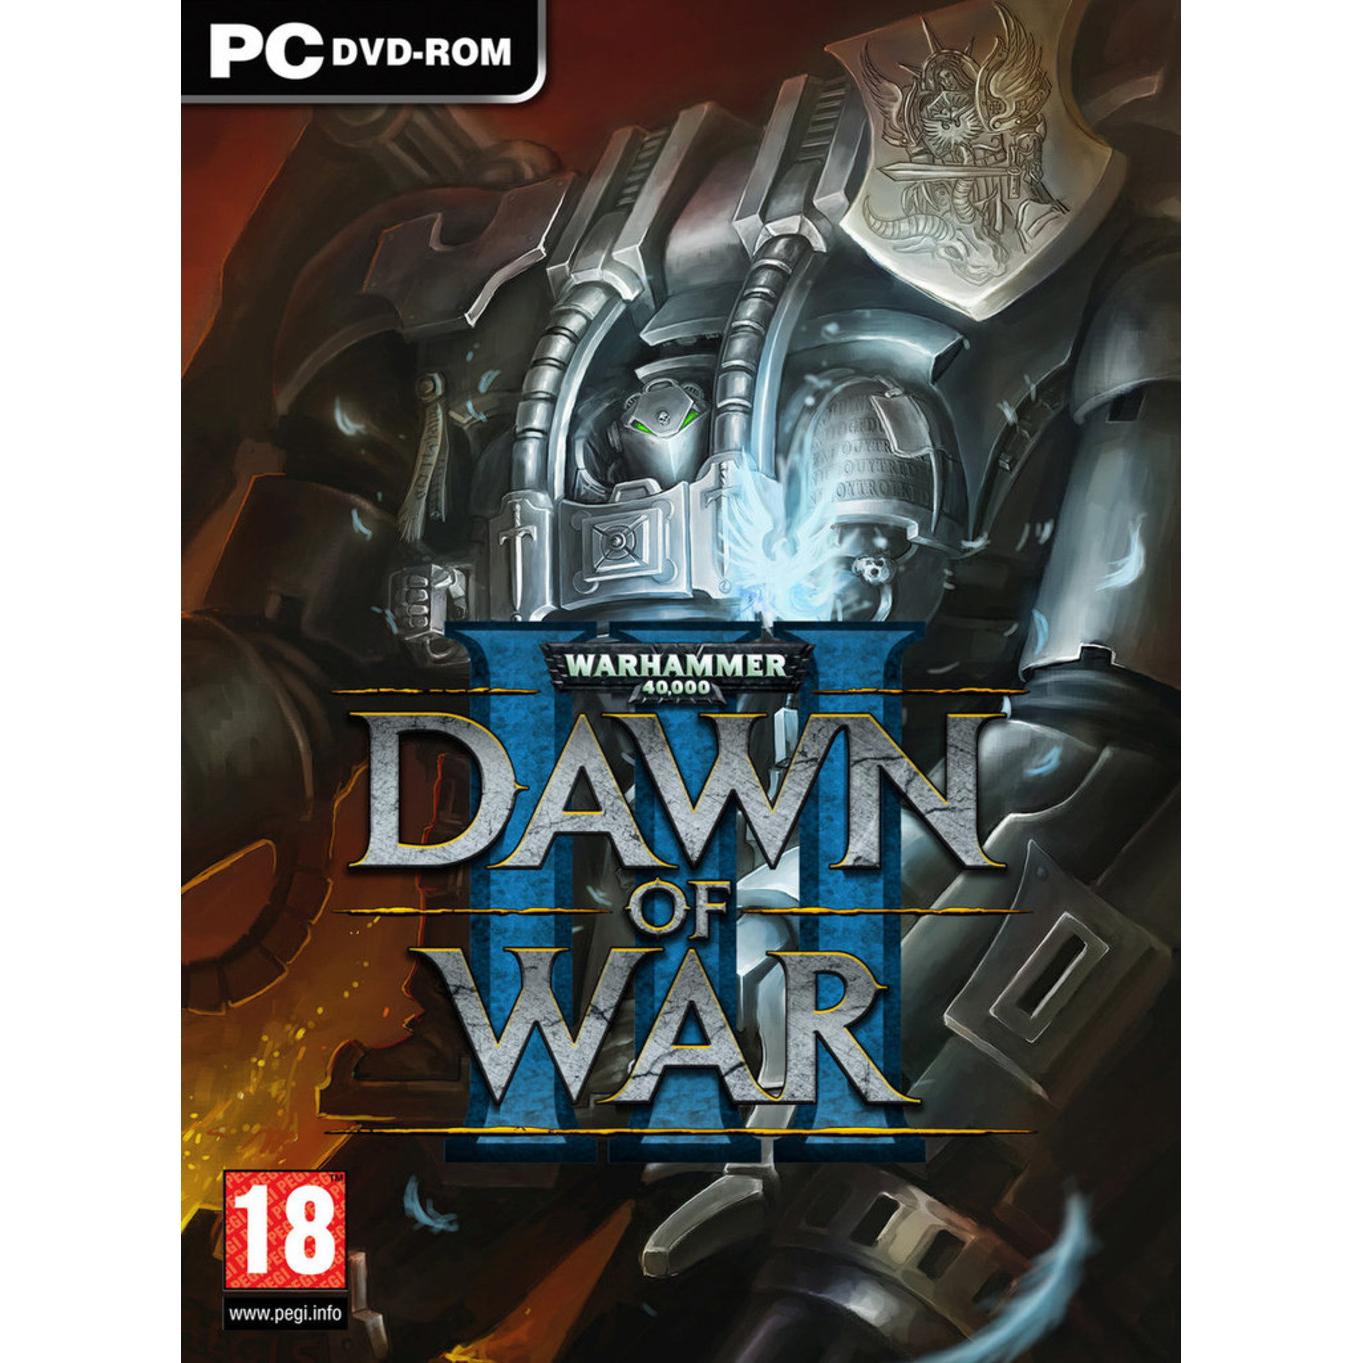 Joc Dawn of War 3 pentru PC 0